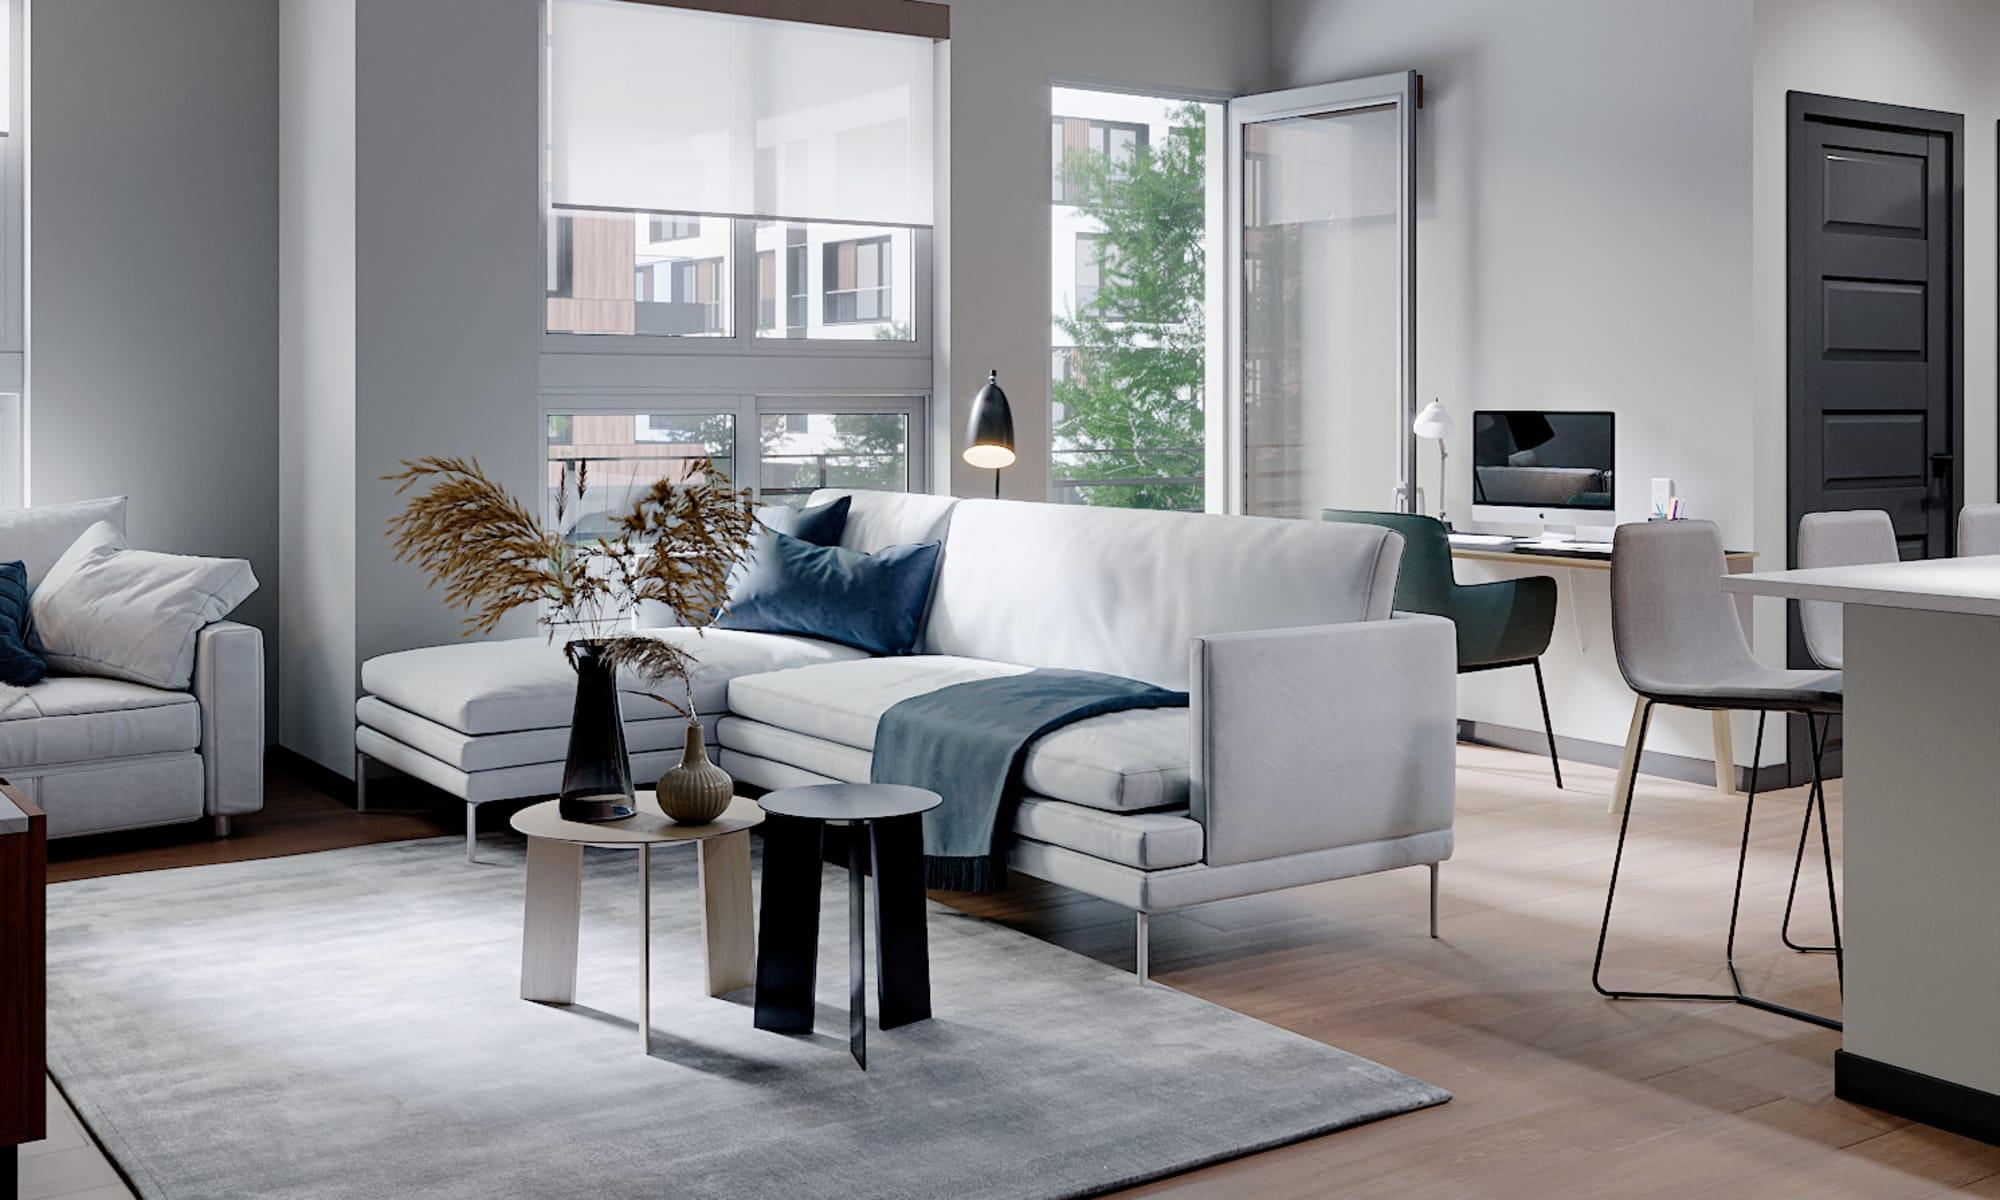 Apartments at Solana Stapleton Apartments in Denver, Colorado